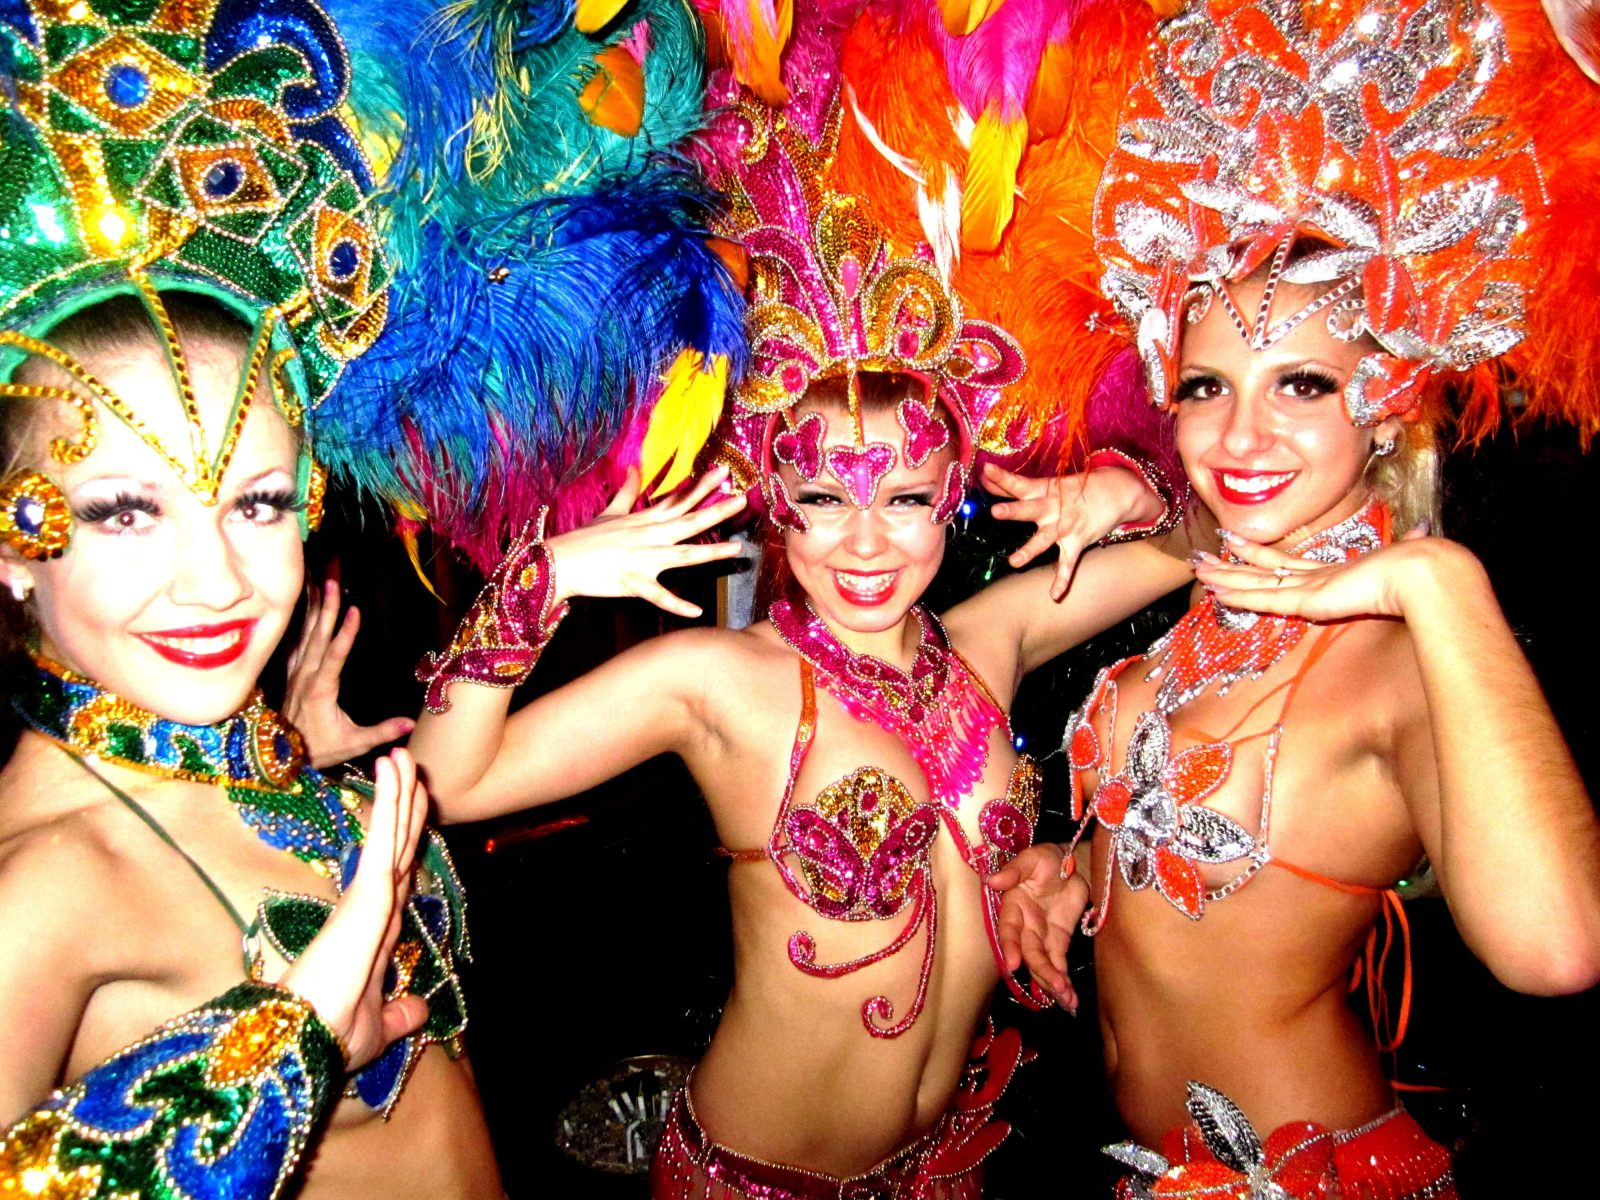 Фото проведения корпоратива по программе Бразильский карнавал от RedG